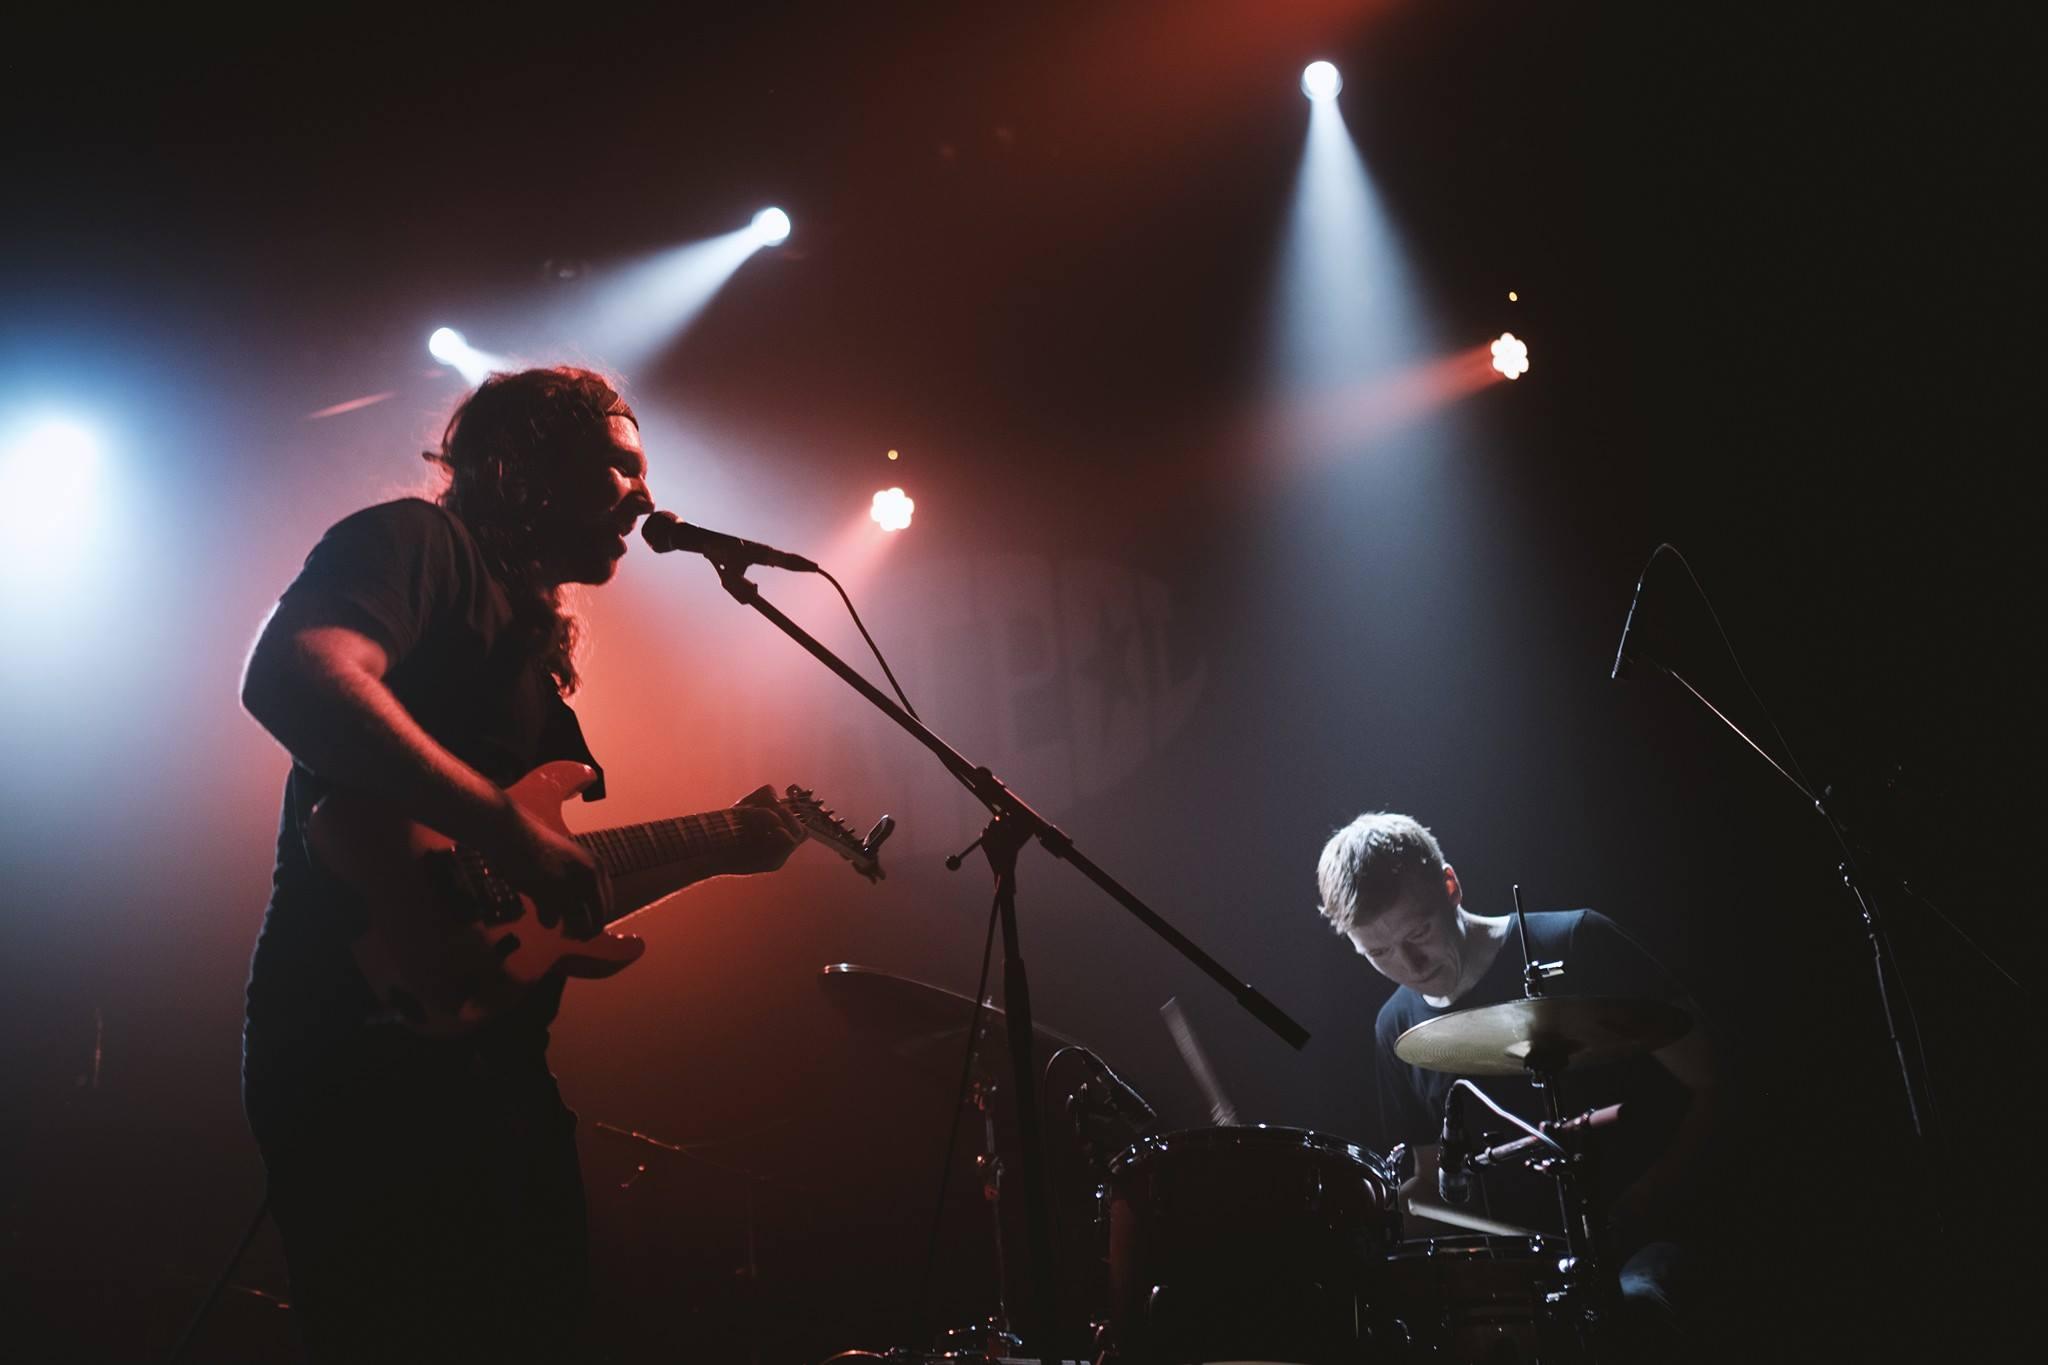 Konzert: Electric Turtles // The Fous